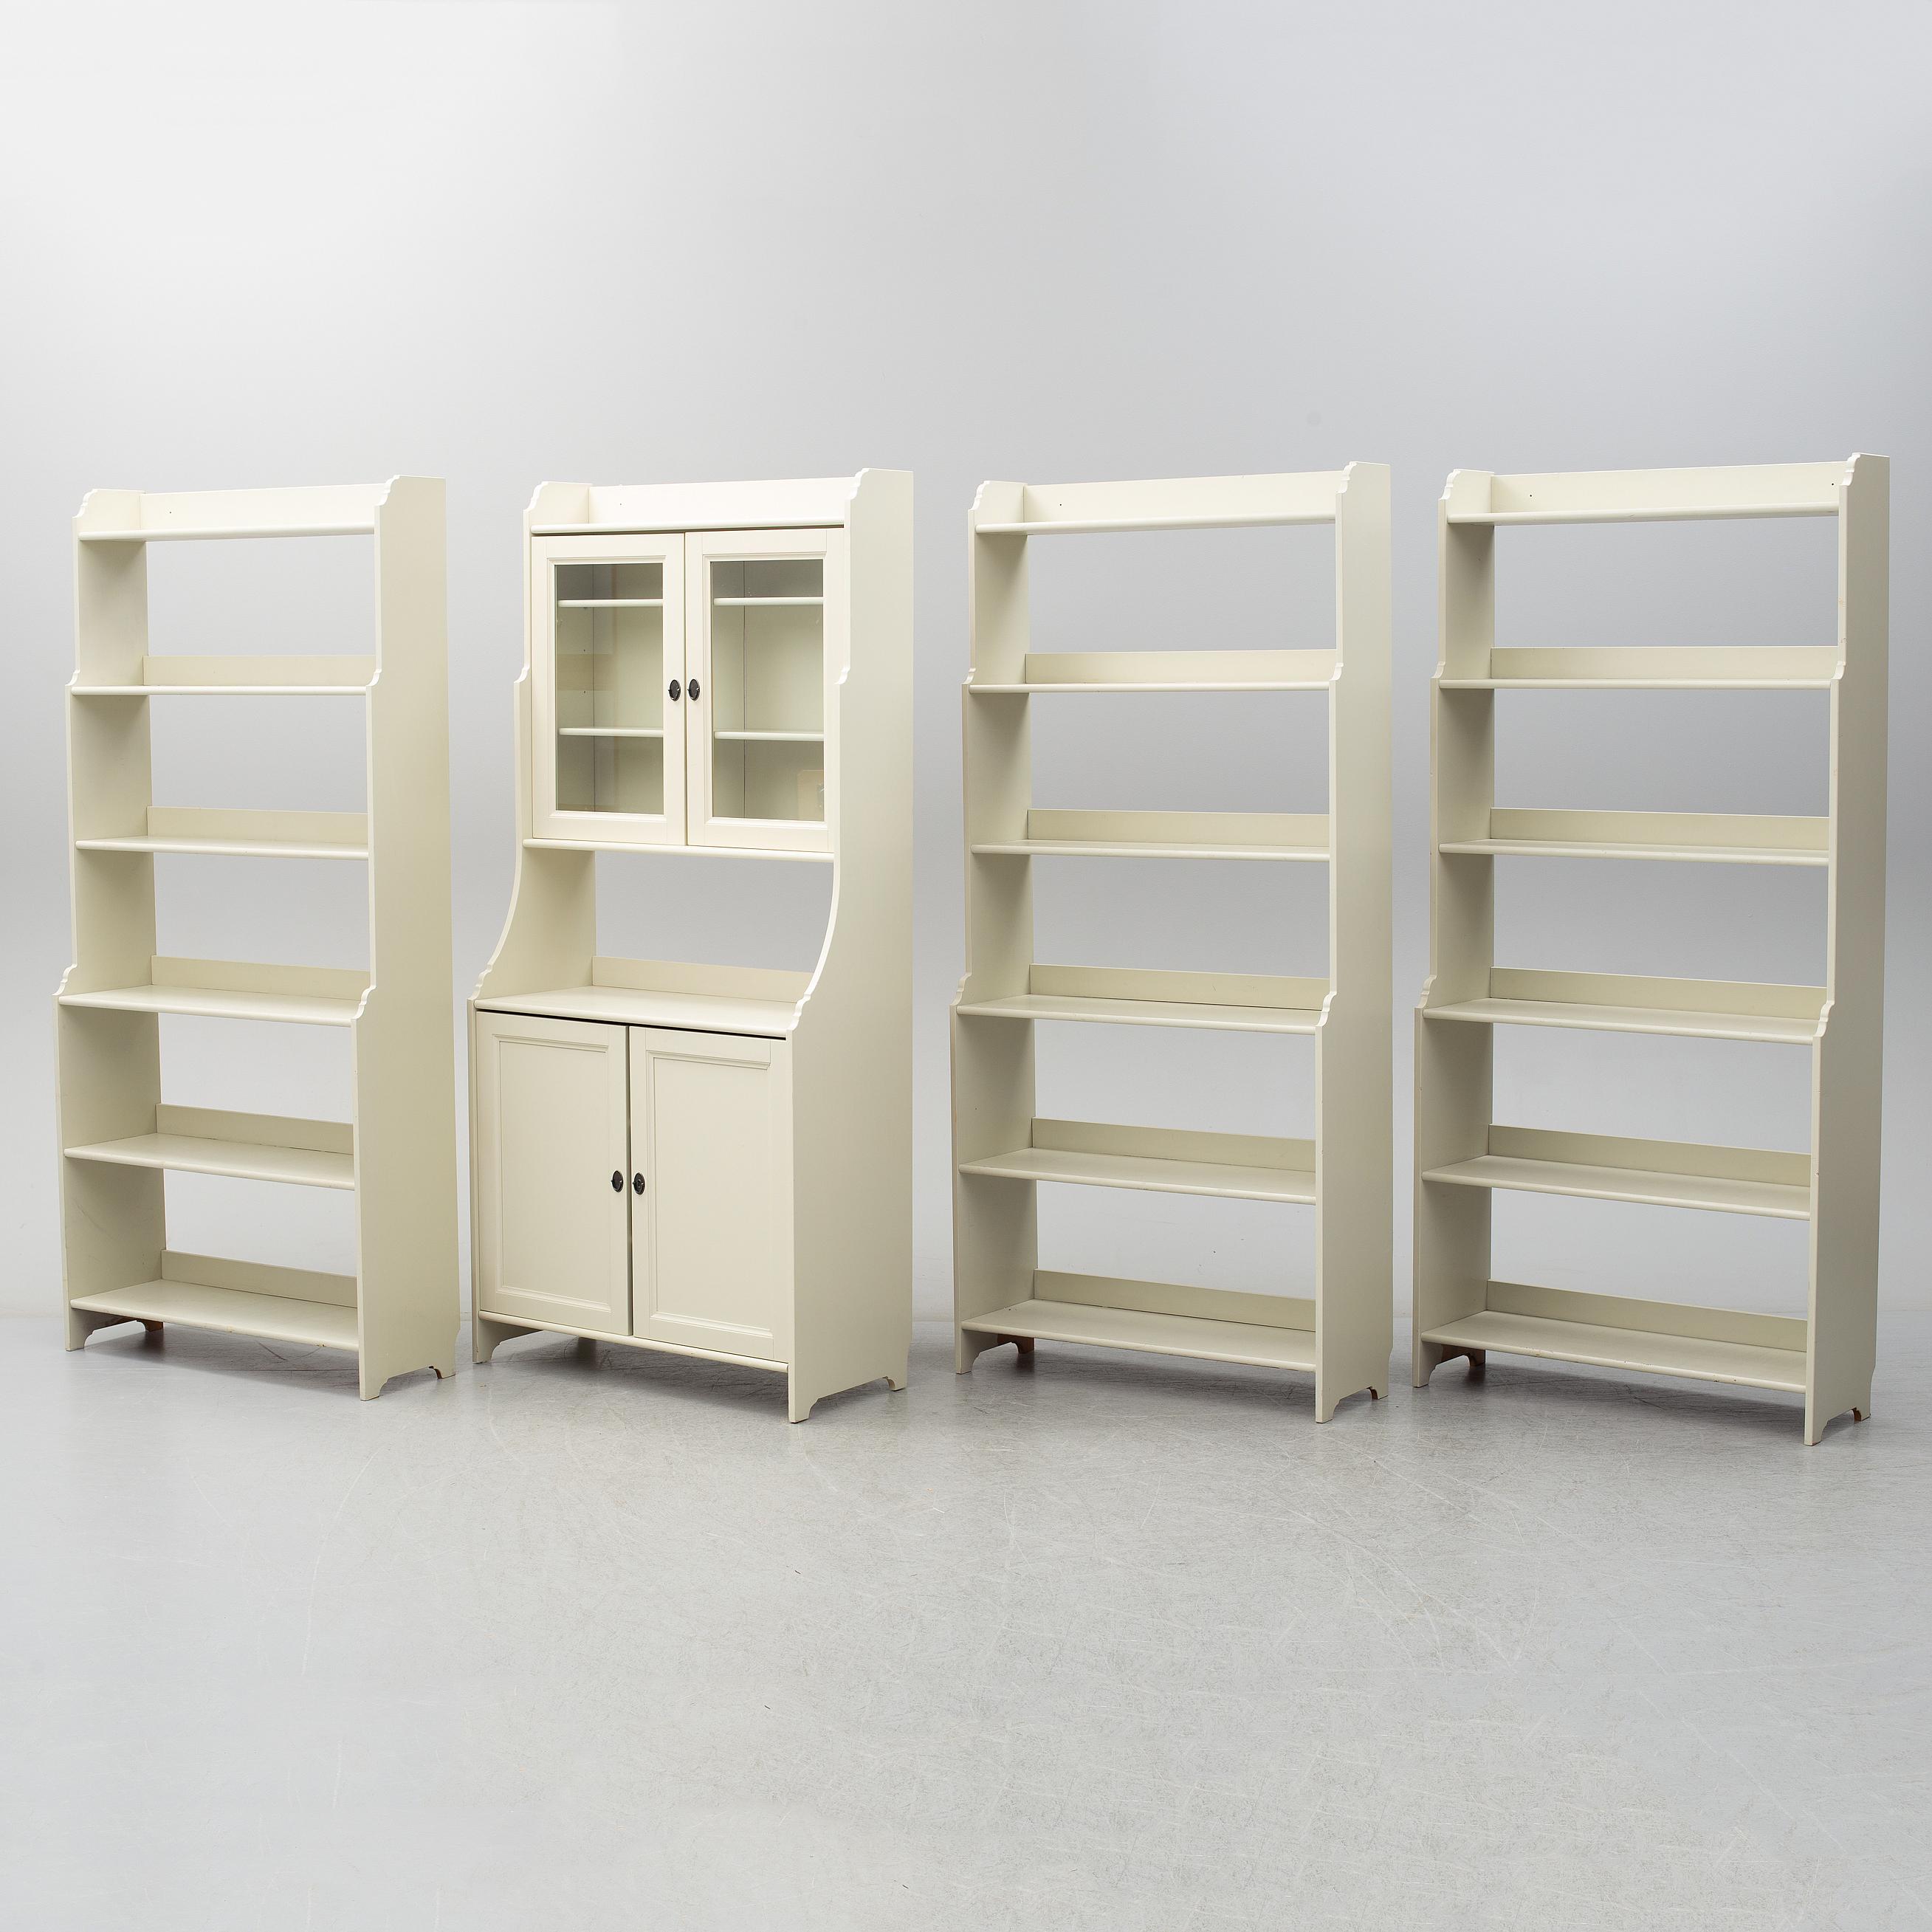 Ikea Leksvik Bureau.Three Bookshelves And A Cupboard Leksvik By Ikea Bukowskis